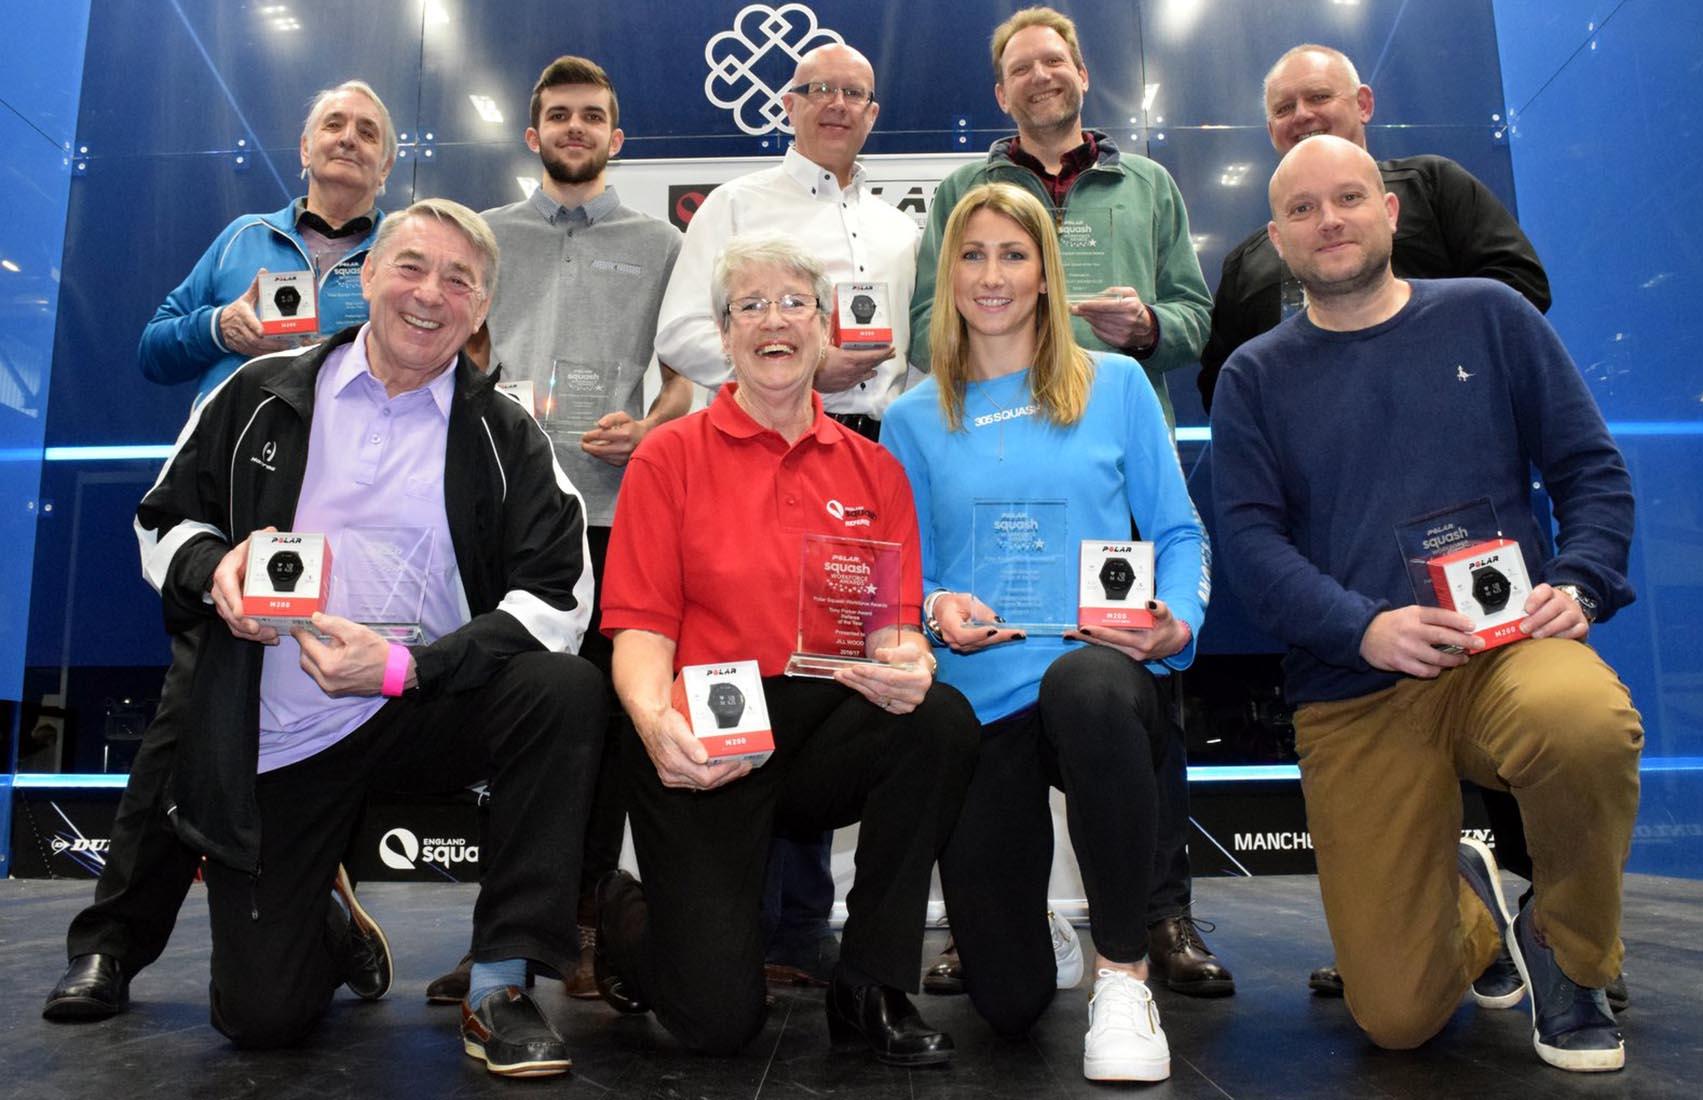 Polar Squash Workforce Award 2016 winners